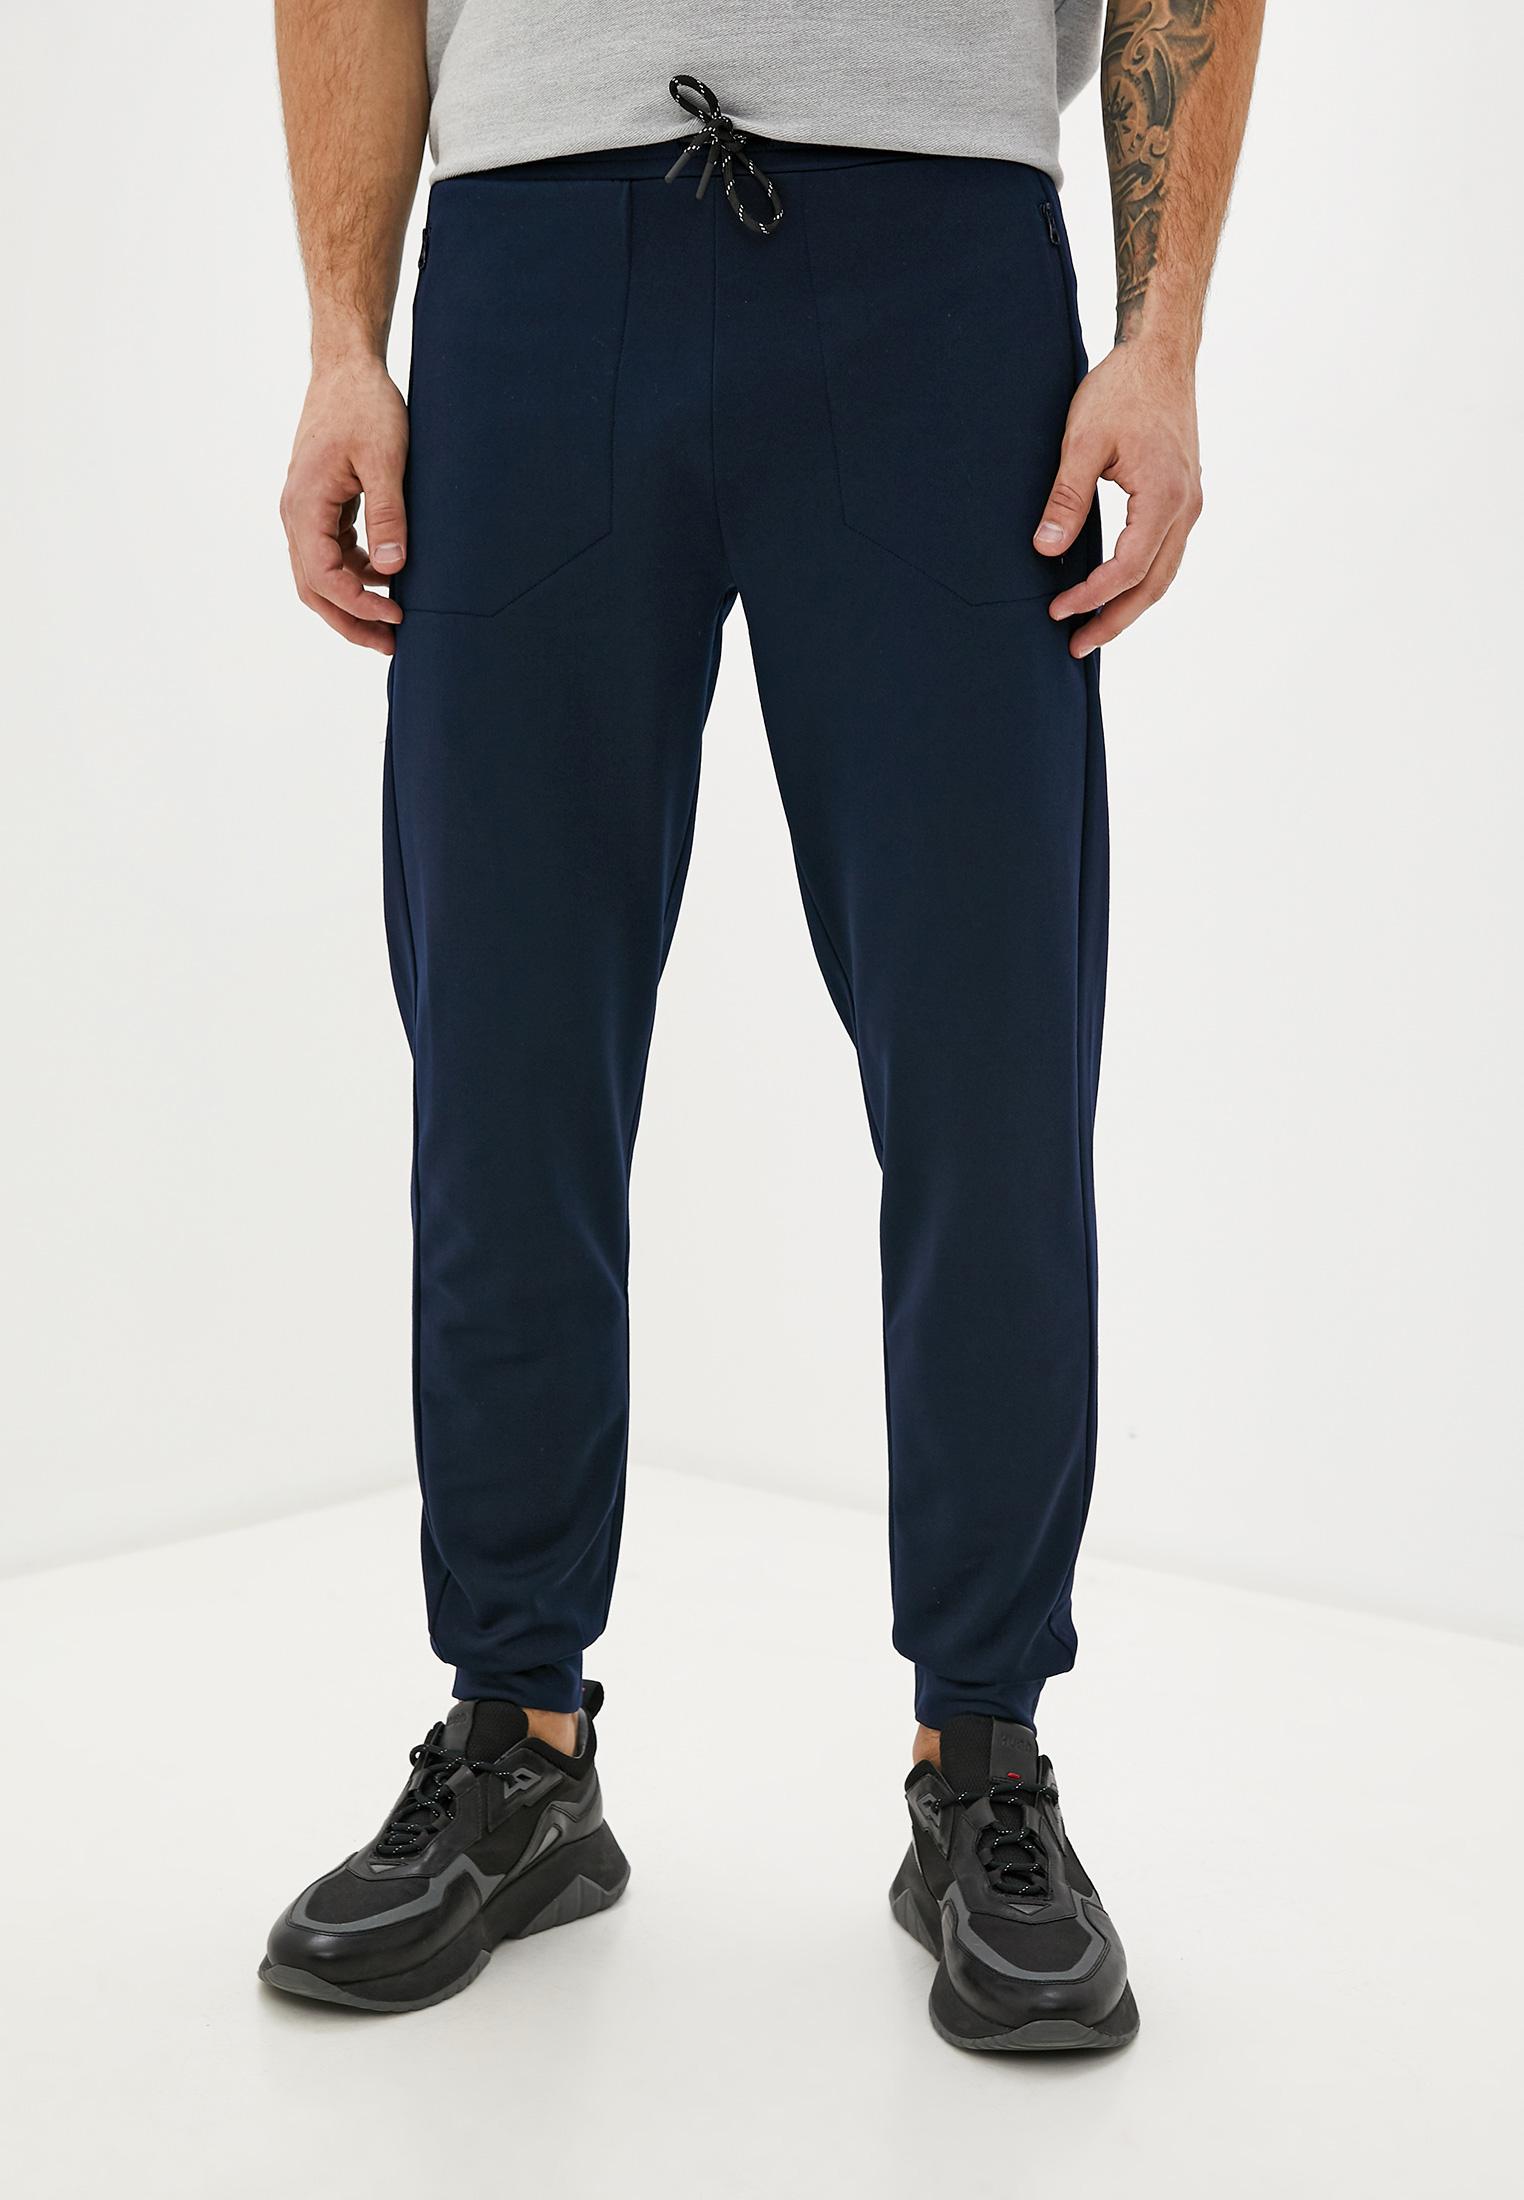 Мужские спортивные брюки Aeronautica Militare (Аэронавтика Милитари) PF734F384